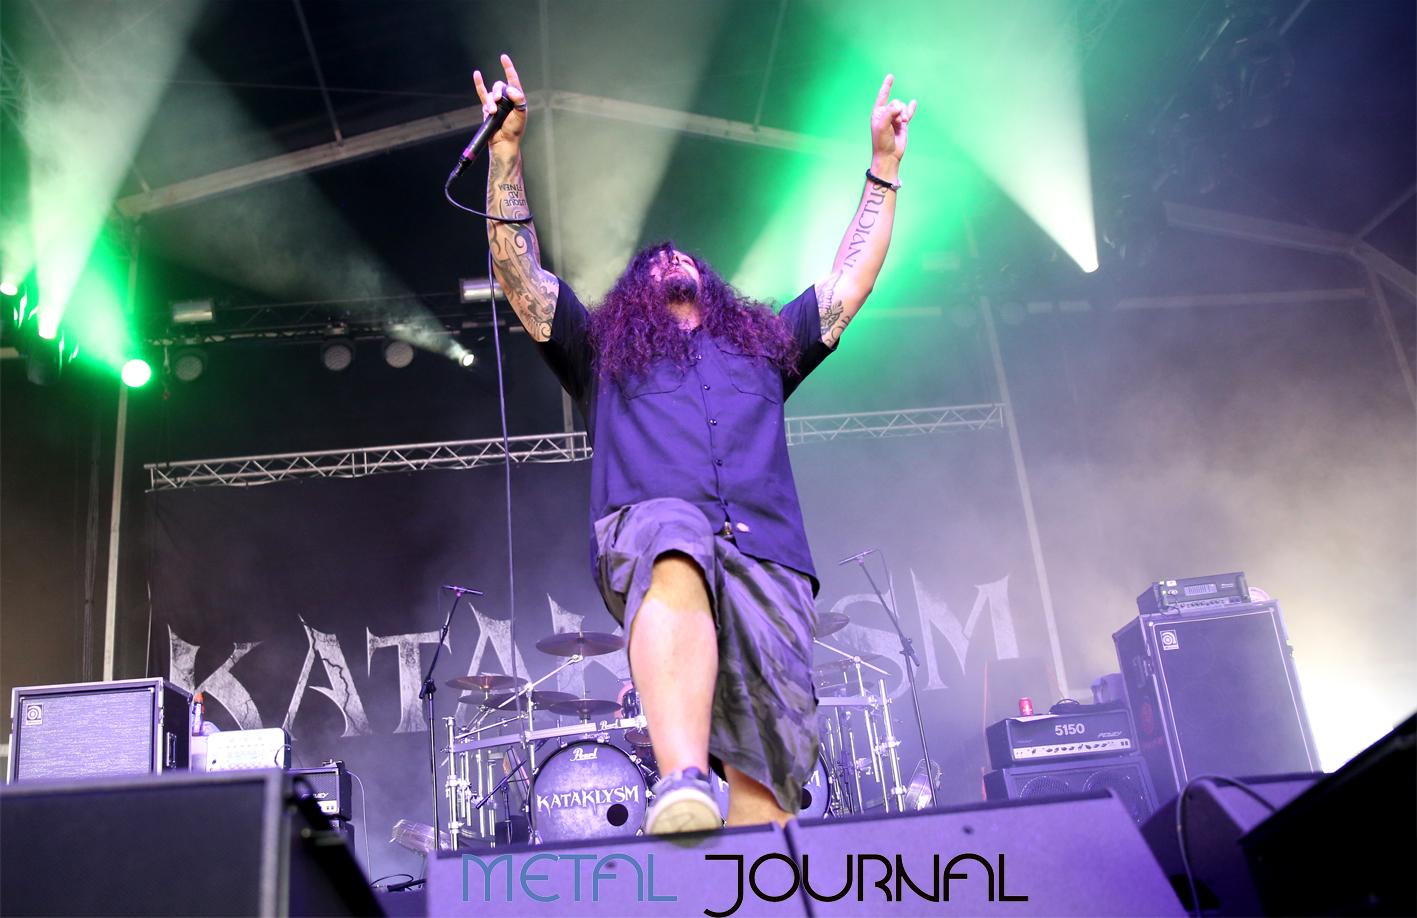 kataklysm rock fest 18 - metal journal pic 4